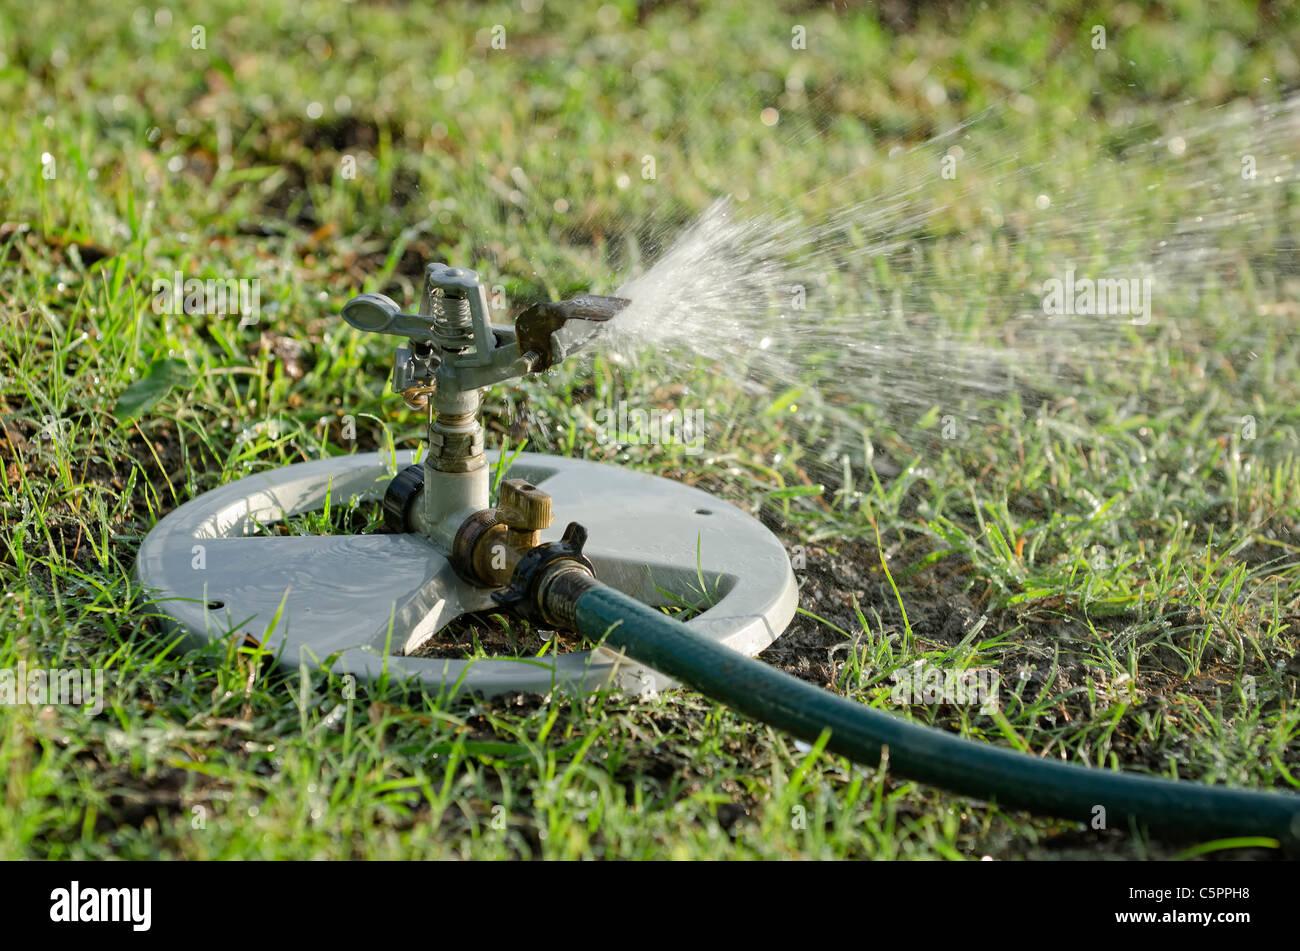 Garden Sprinkler - Stock Image